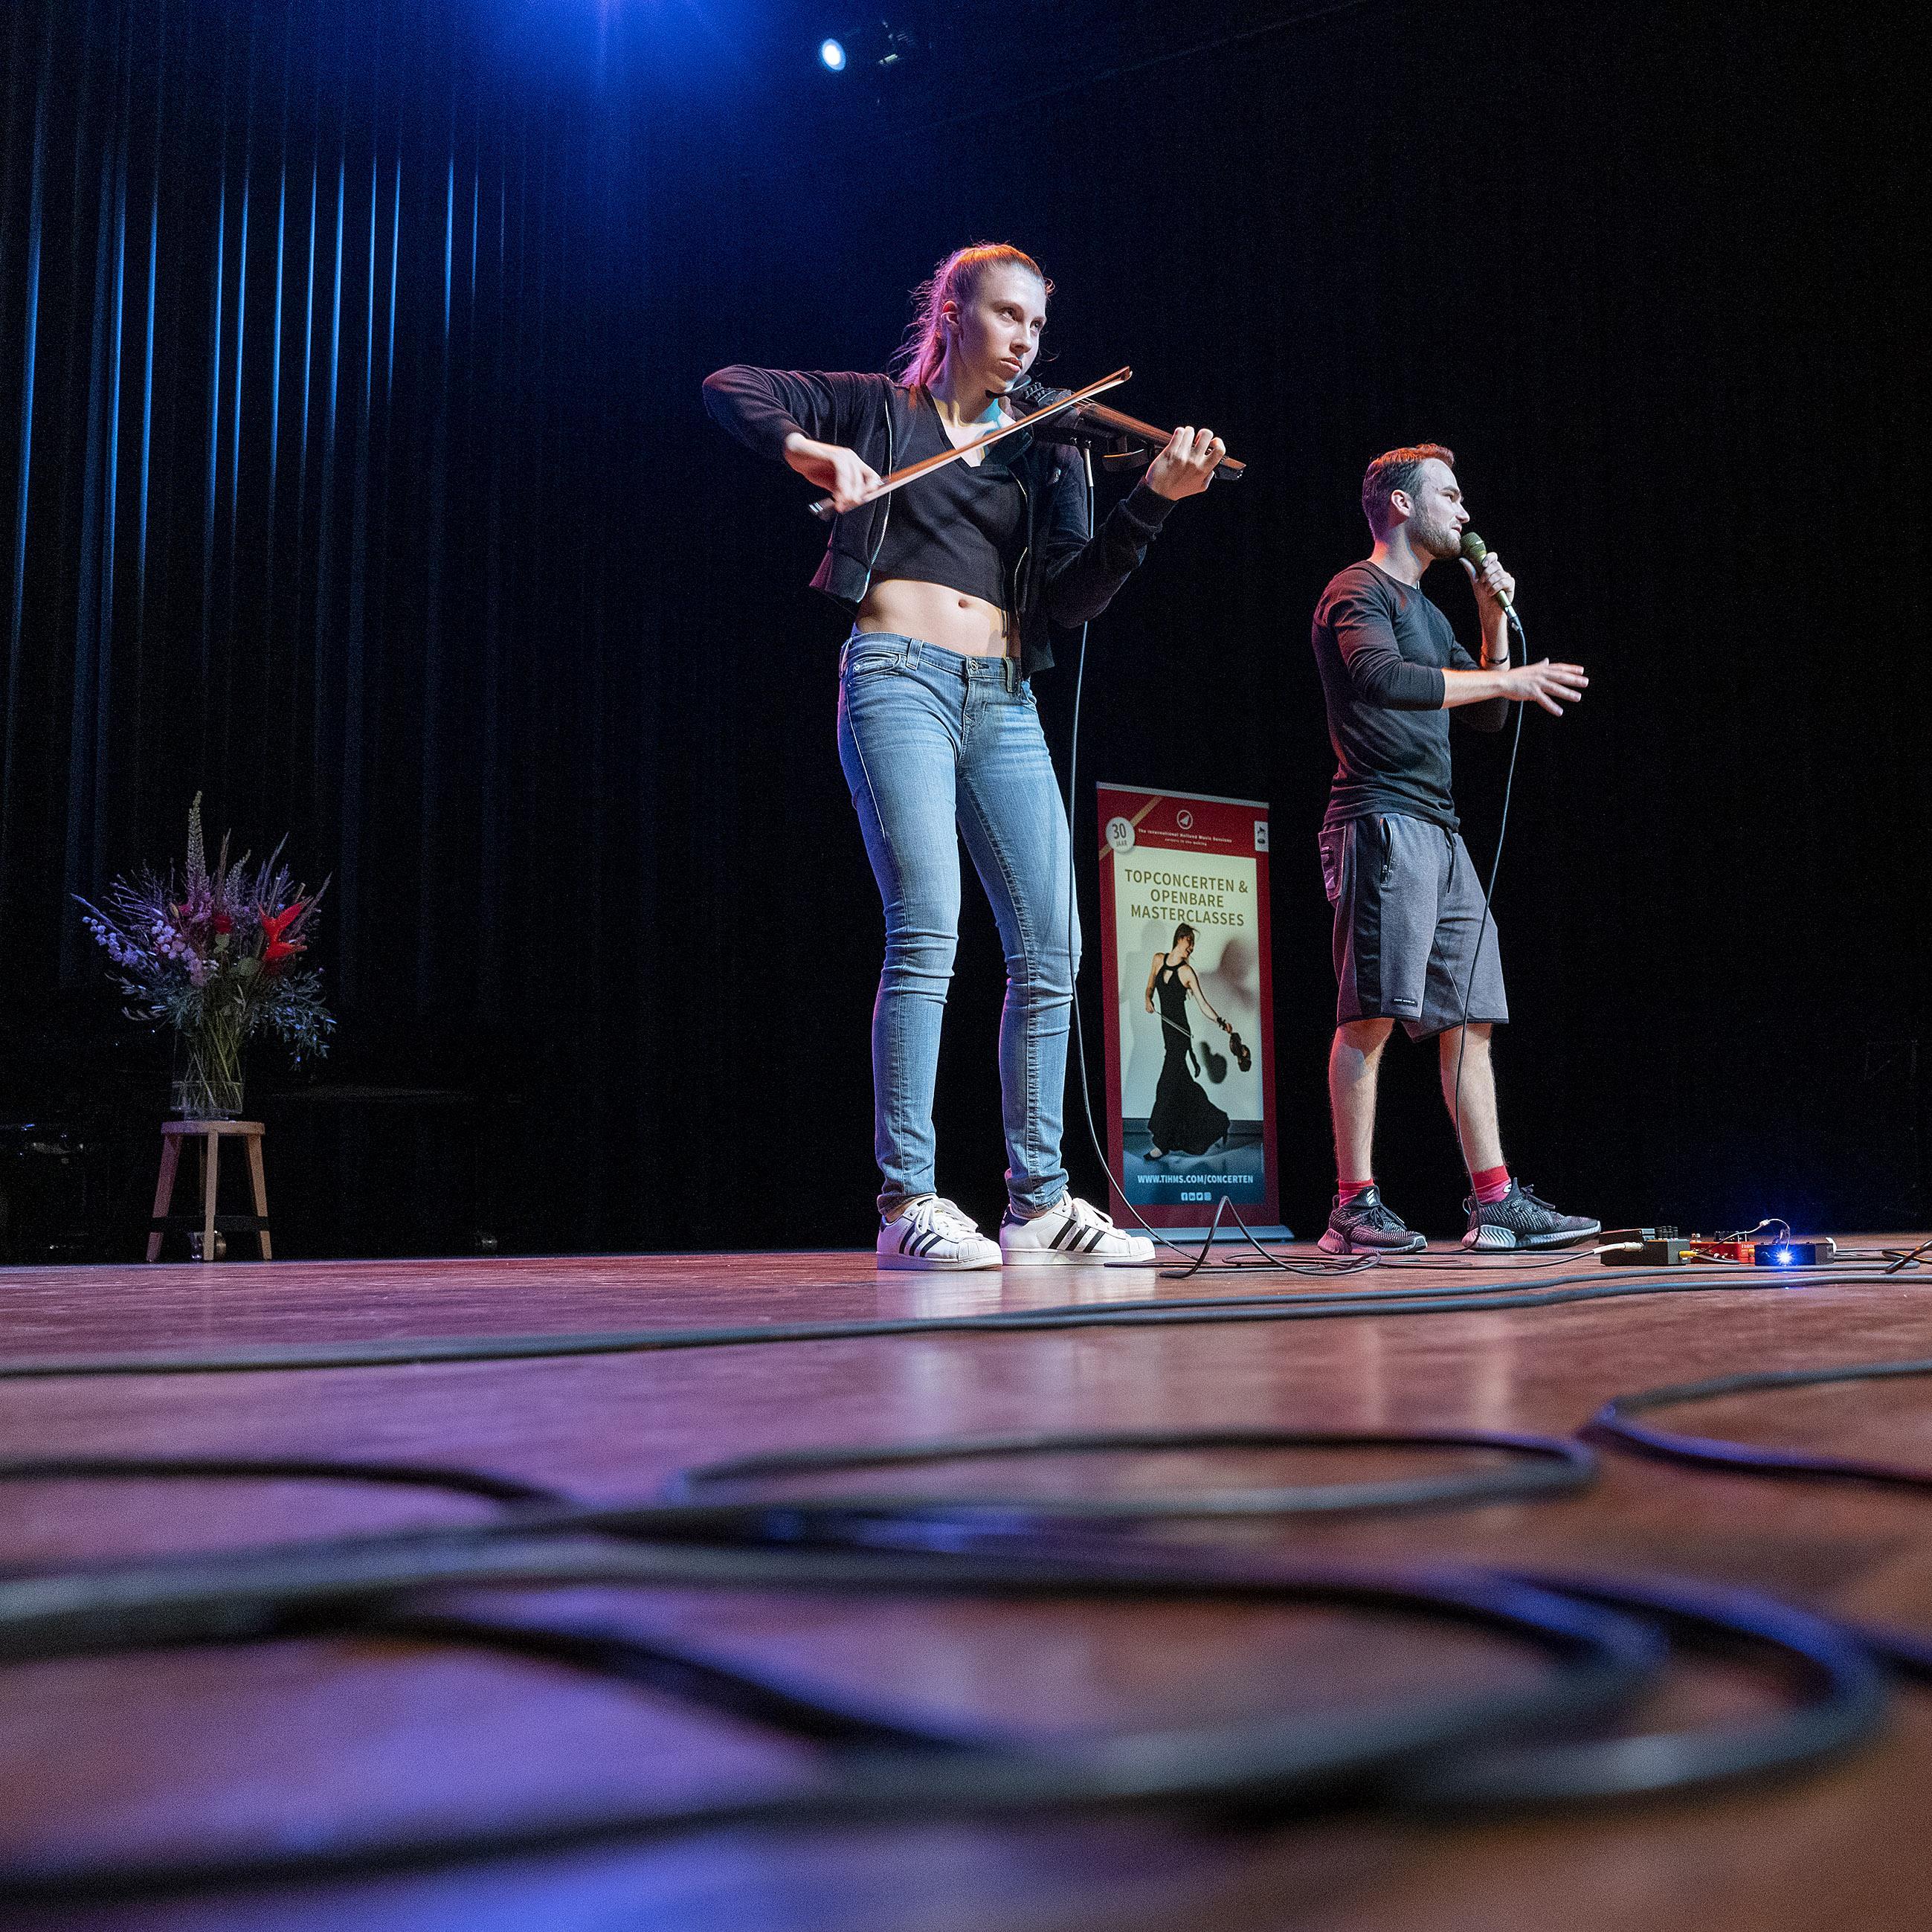 Goed jubileumjaar van klassiek zomerfestival Holland Music Sessions